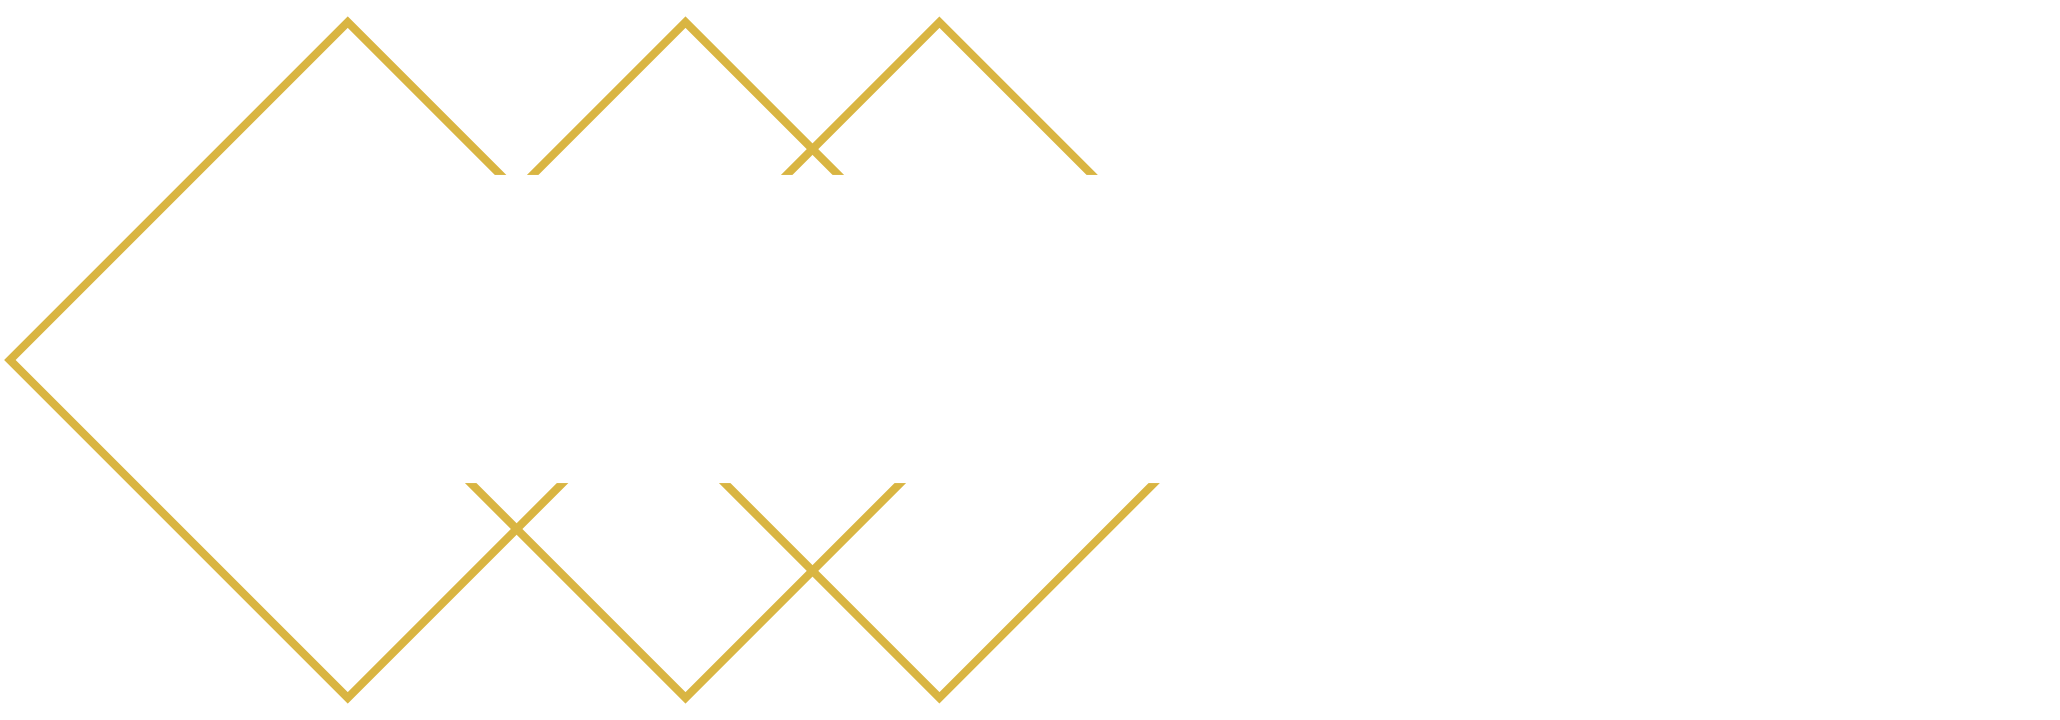 Sanrio黃金壓歲錢